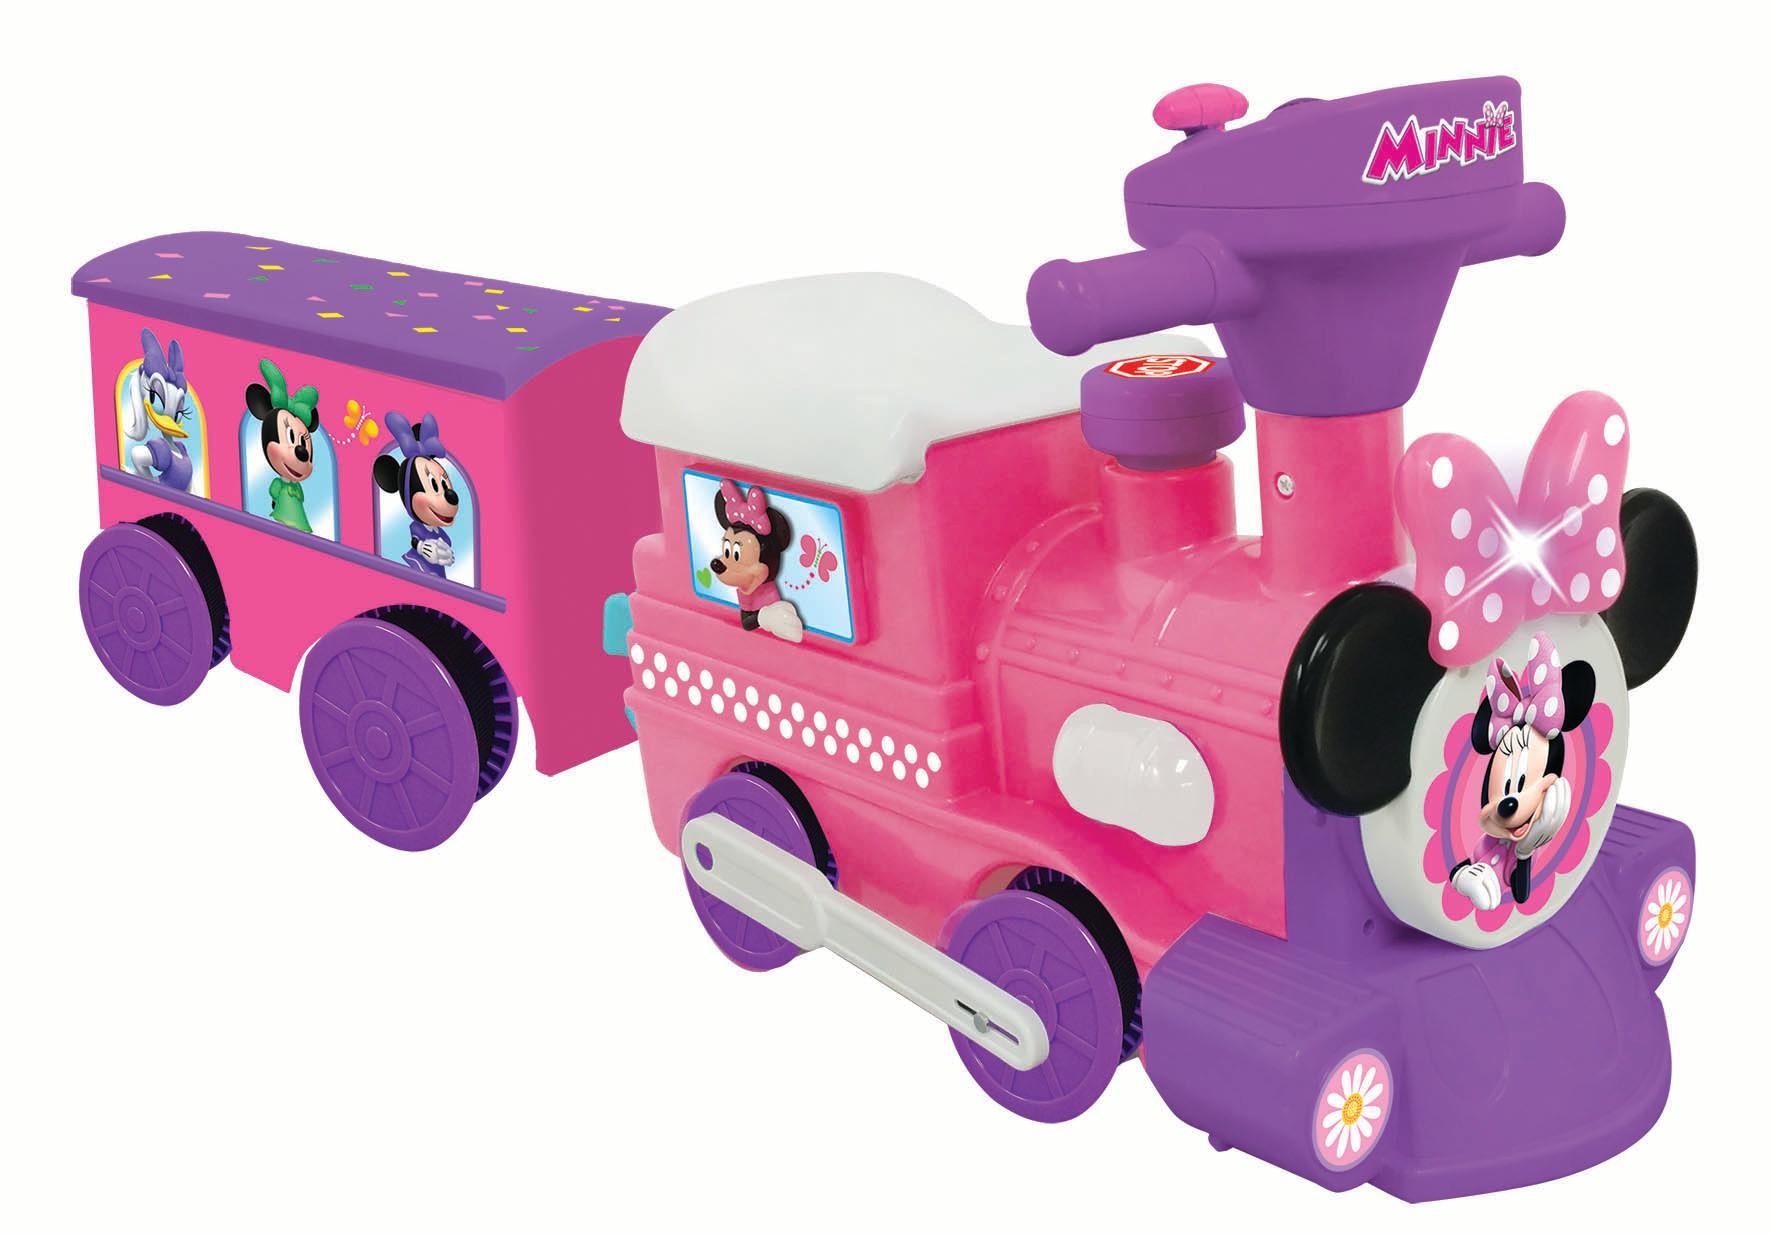 Disney Minnie Mouse Choo Choo Train With Tracks